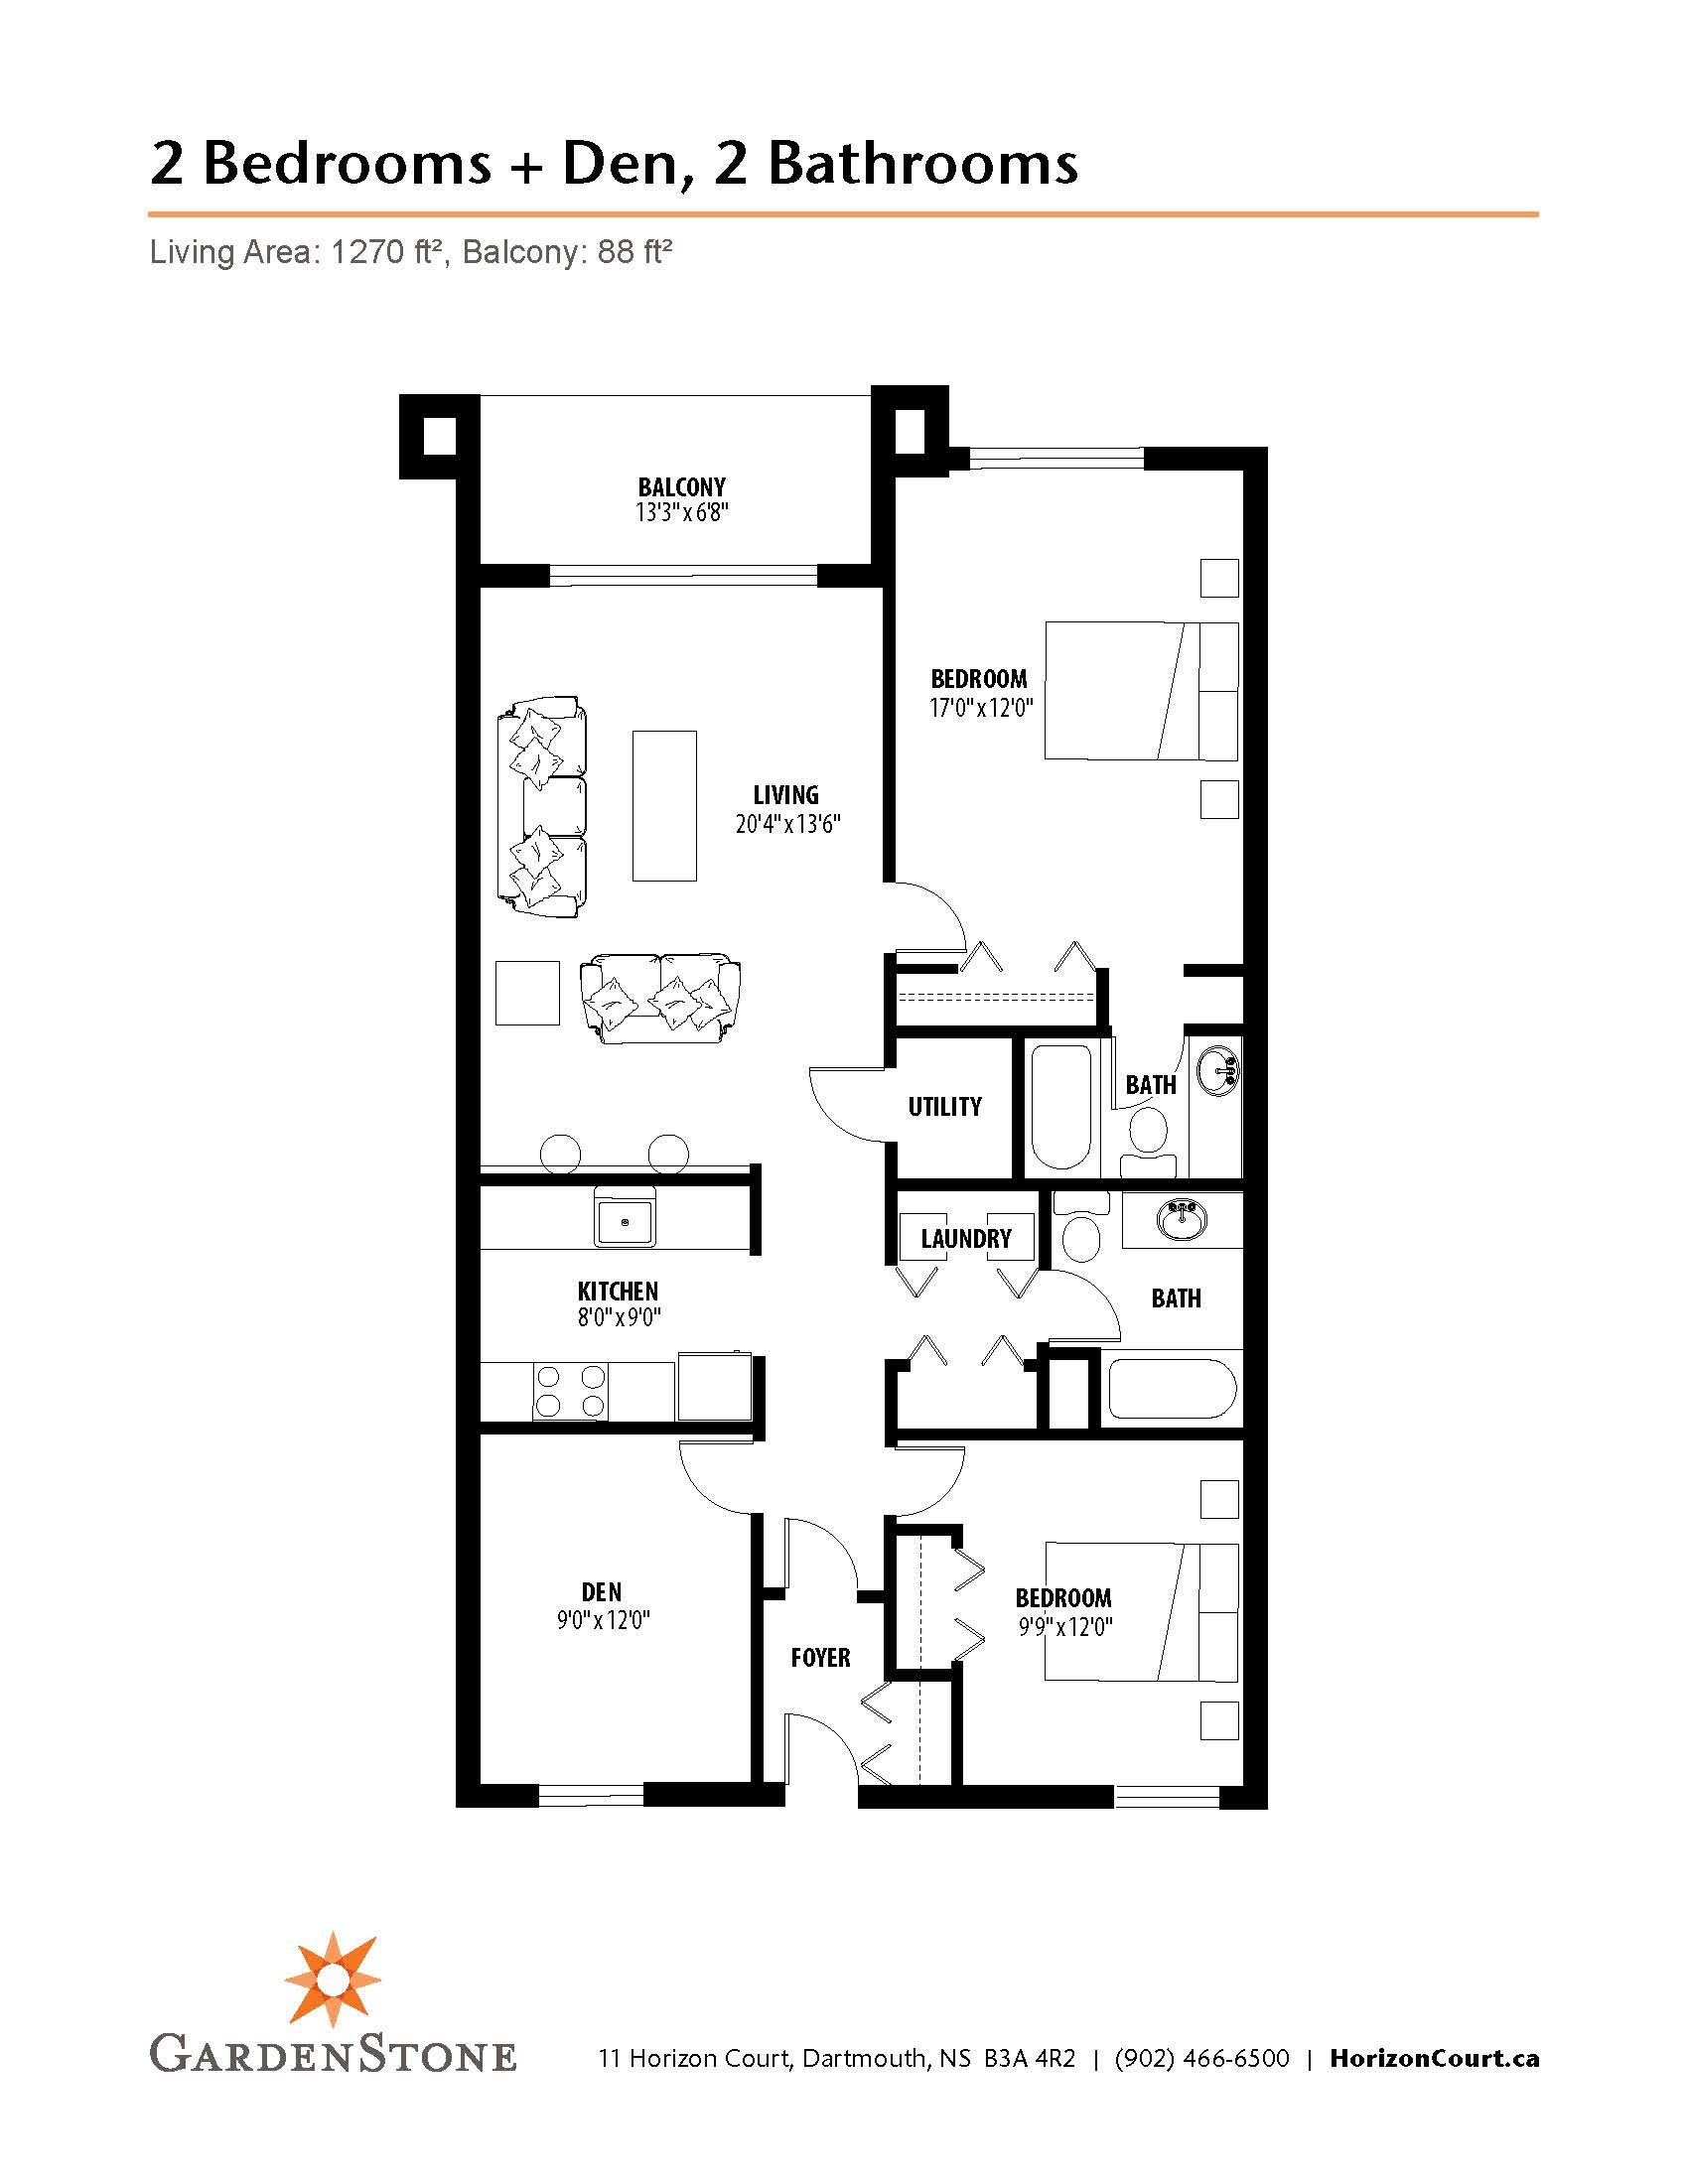 galley style kitchen floor plans - wood floors